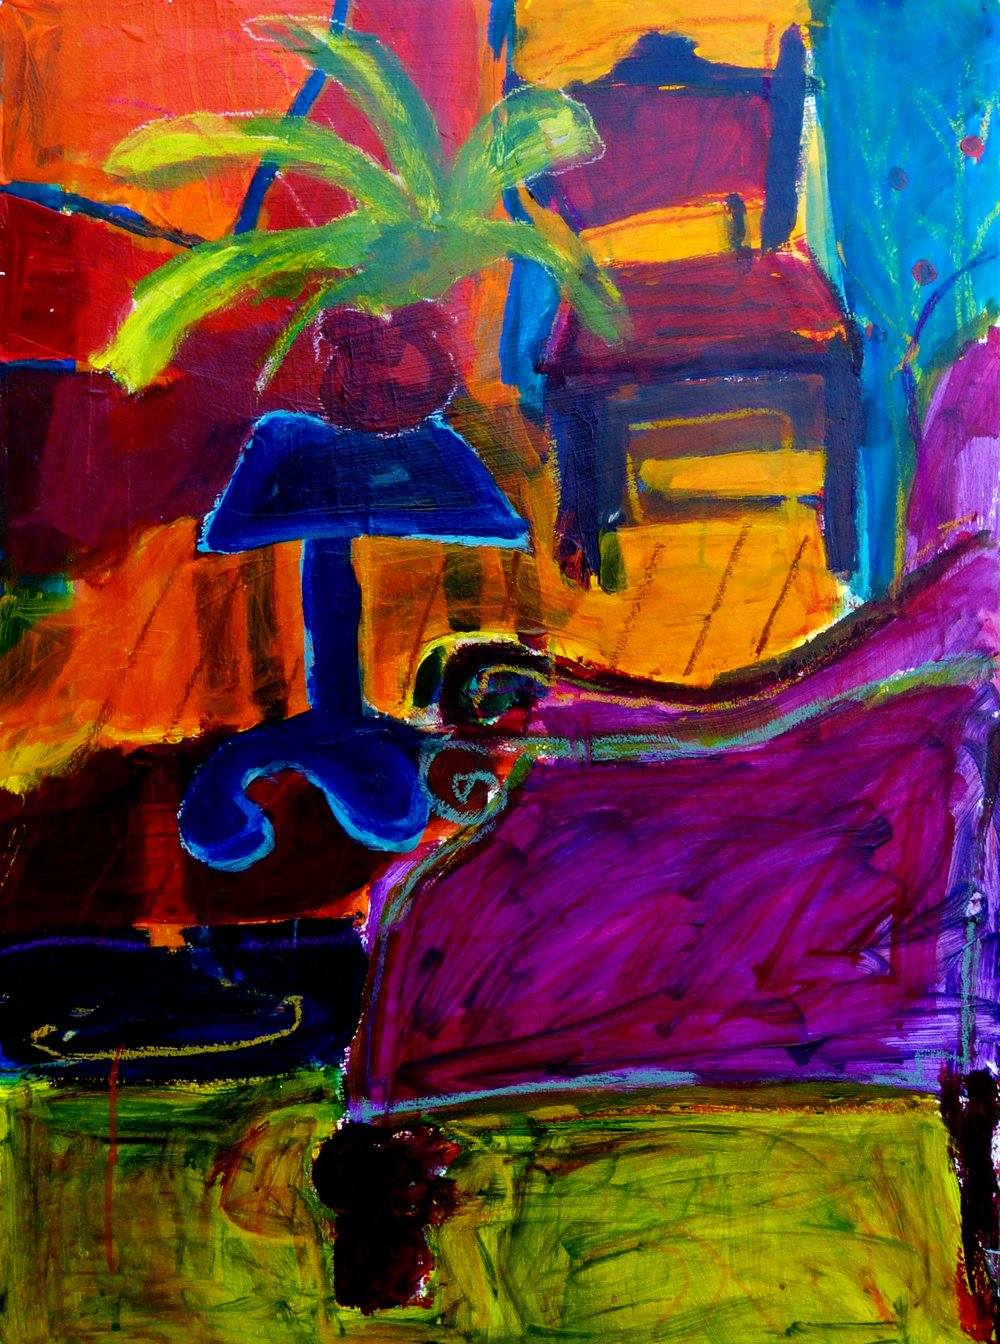 Linda Bankerd_Interior with Magenta Chair_2016_Acrylic on canvas_30_ x 22__$550.jpg